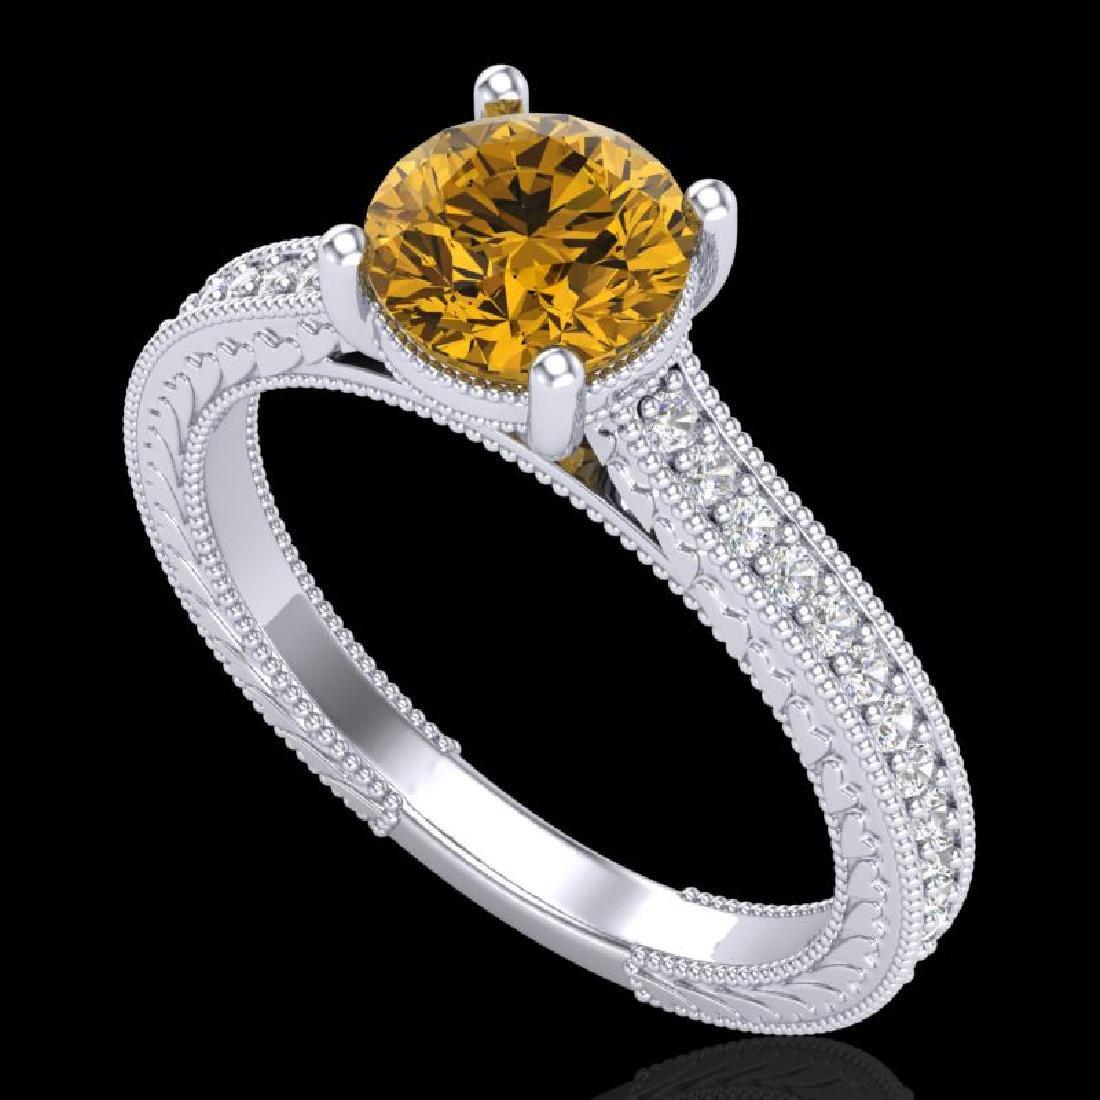 1.45 CTW Intense Fancy Yellow Diamond Engagement Art